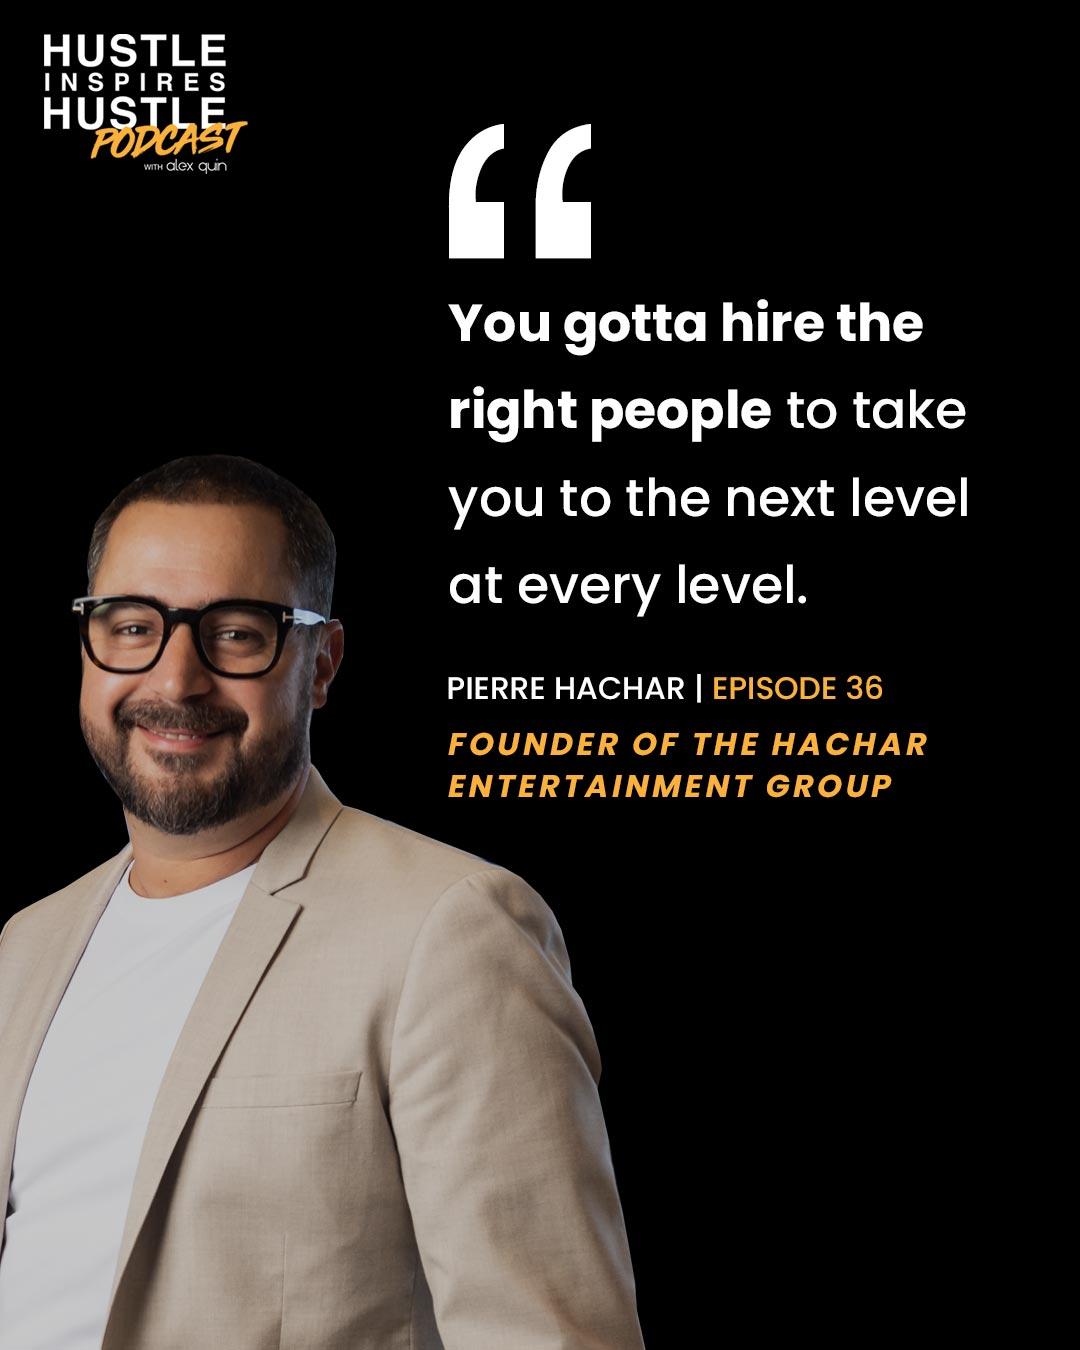 Pierre Hachar & Alex Quin Hustle Inspires hustle Podcast